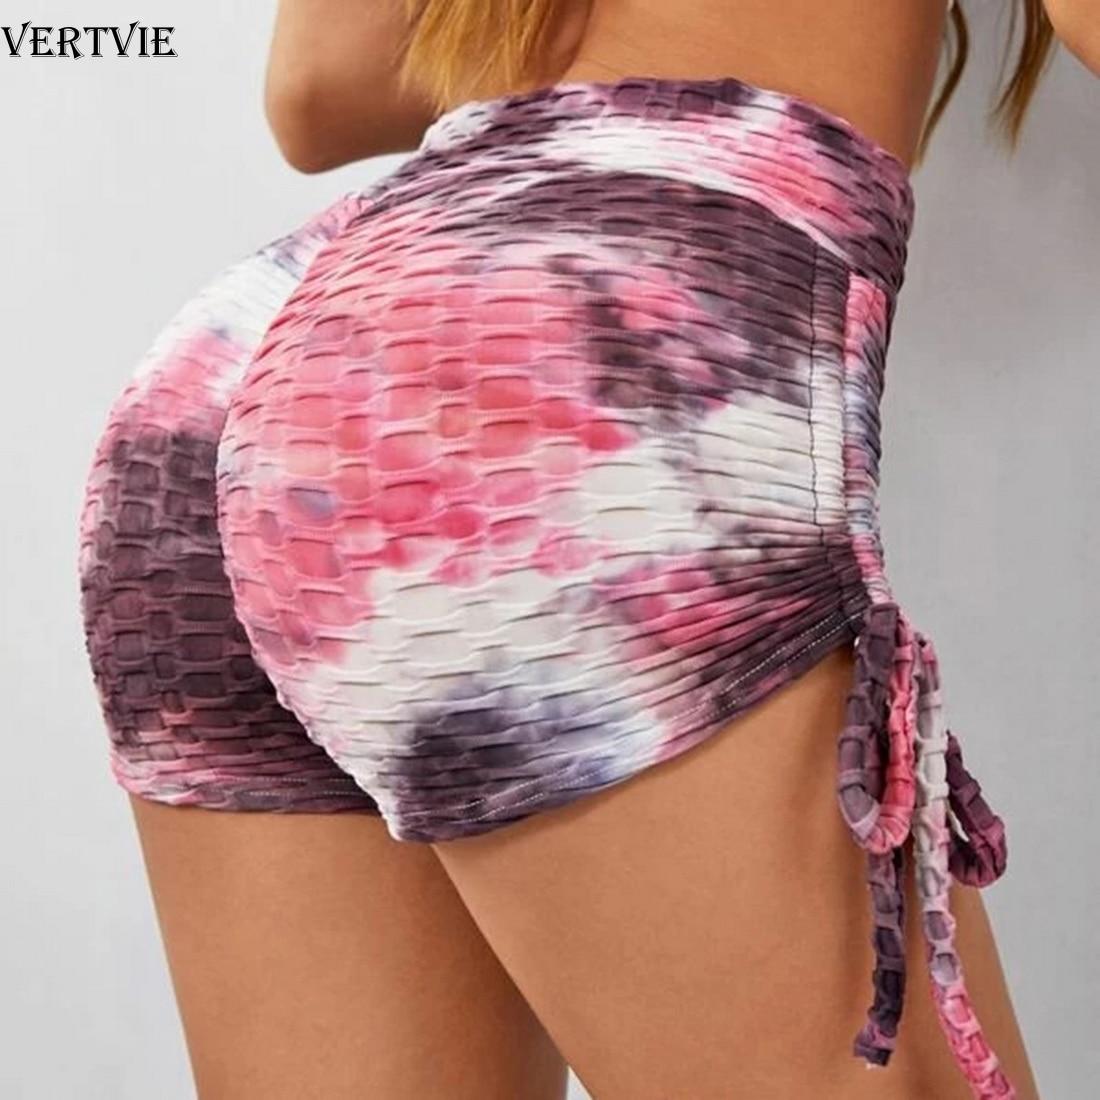 VERTVIE Yoga Shorts Women Sexy Push Up Fitness Short Legging High Waist Gym Trunks Running Tights Sportswear Striped Underwear